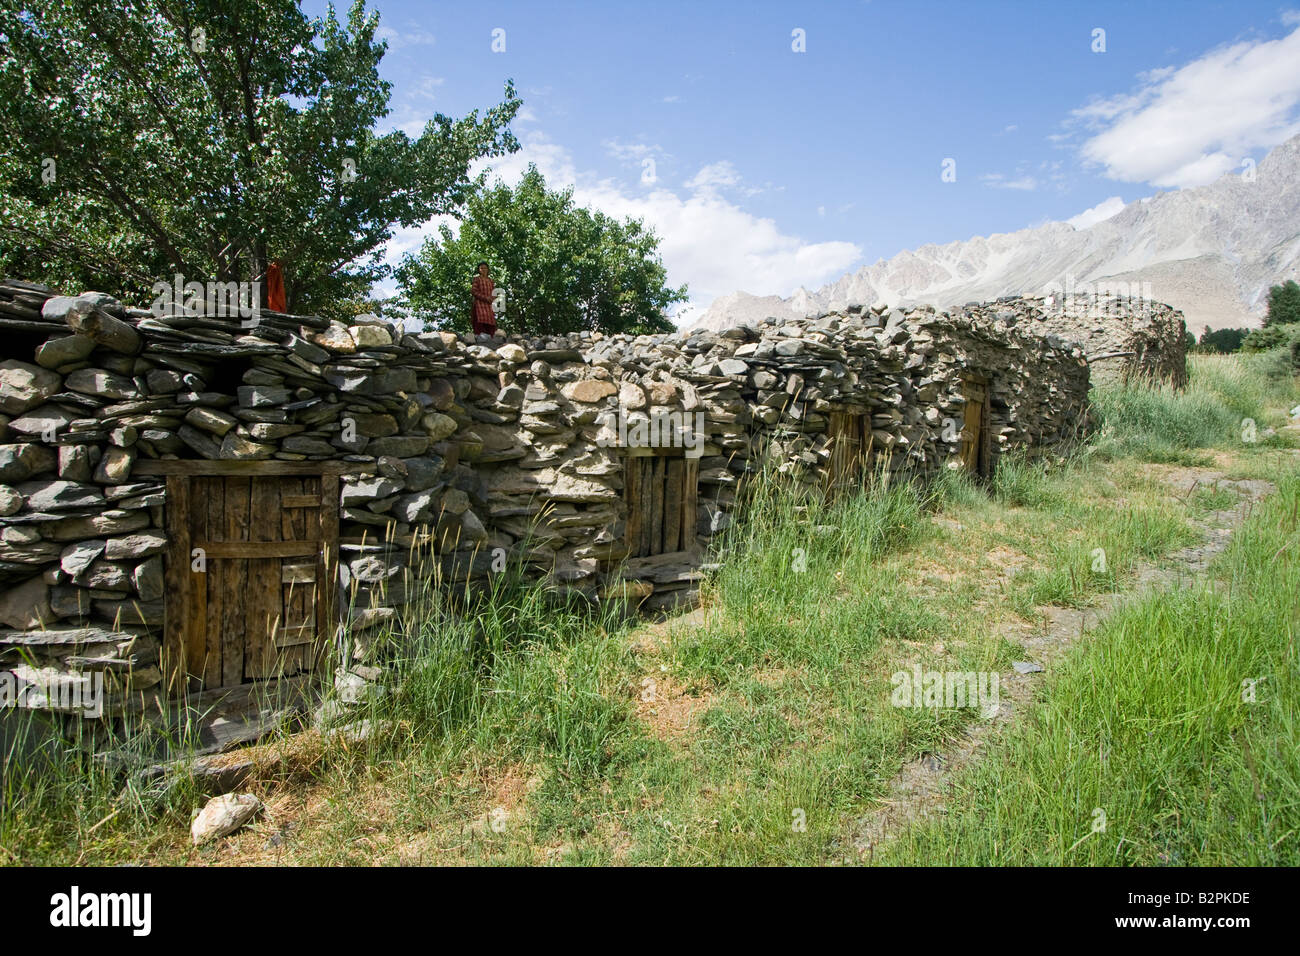 Stone Buildings in Passu Northern Pakistan - Stock Image